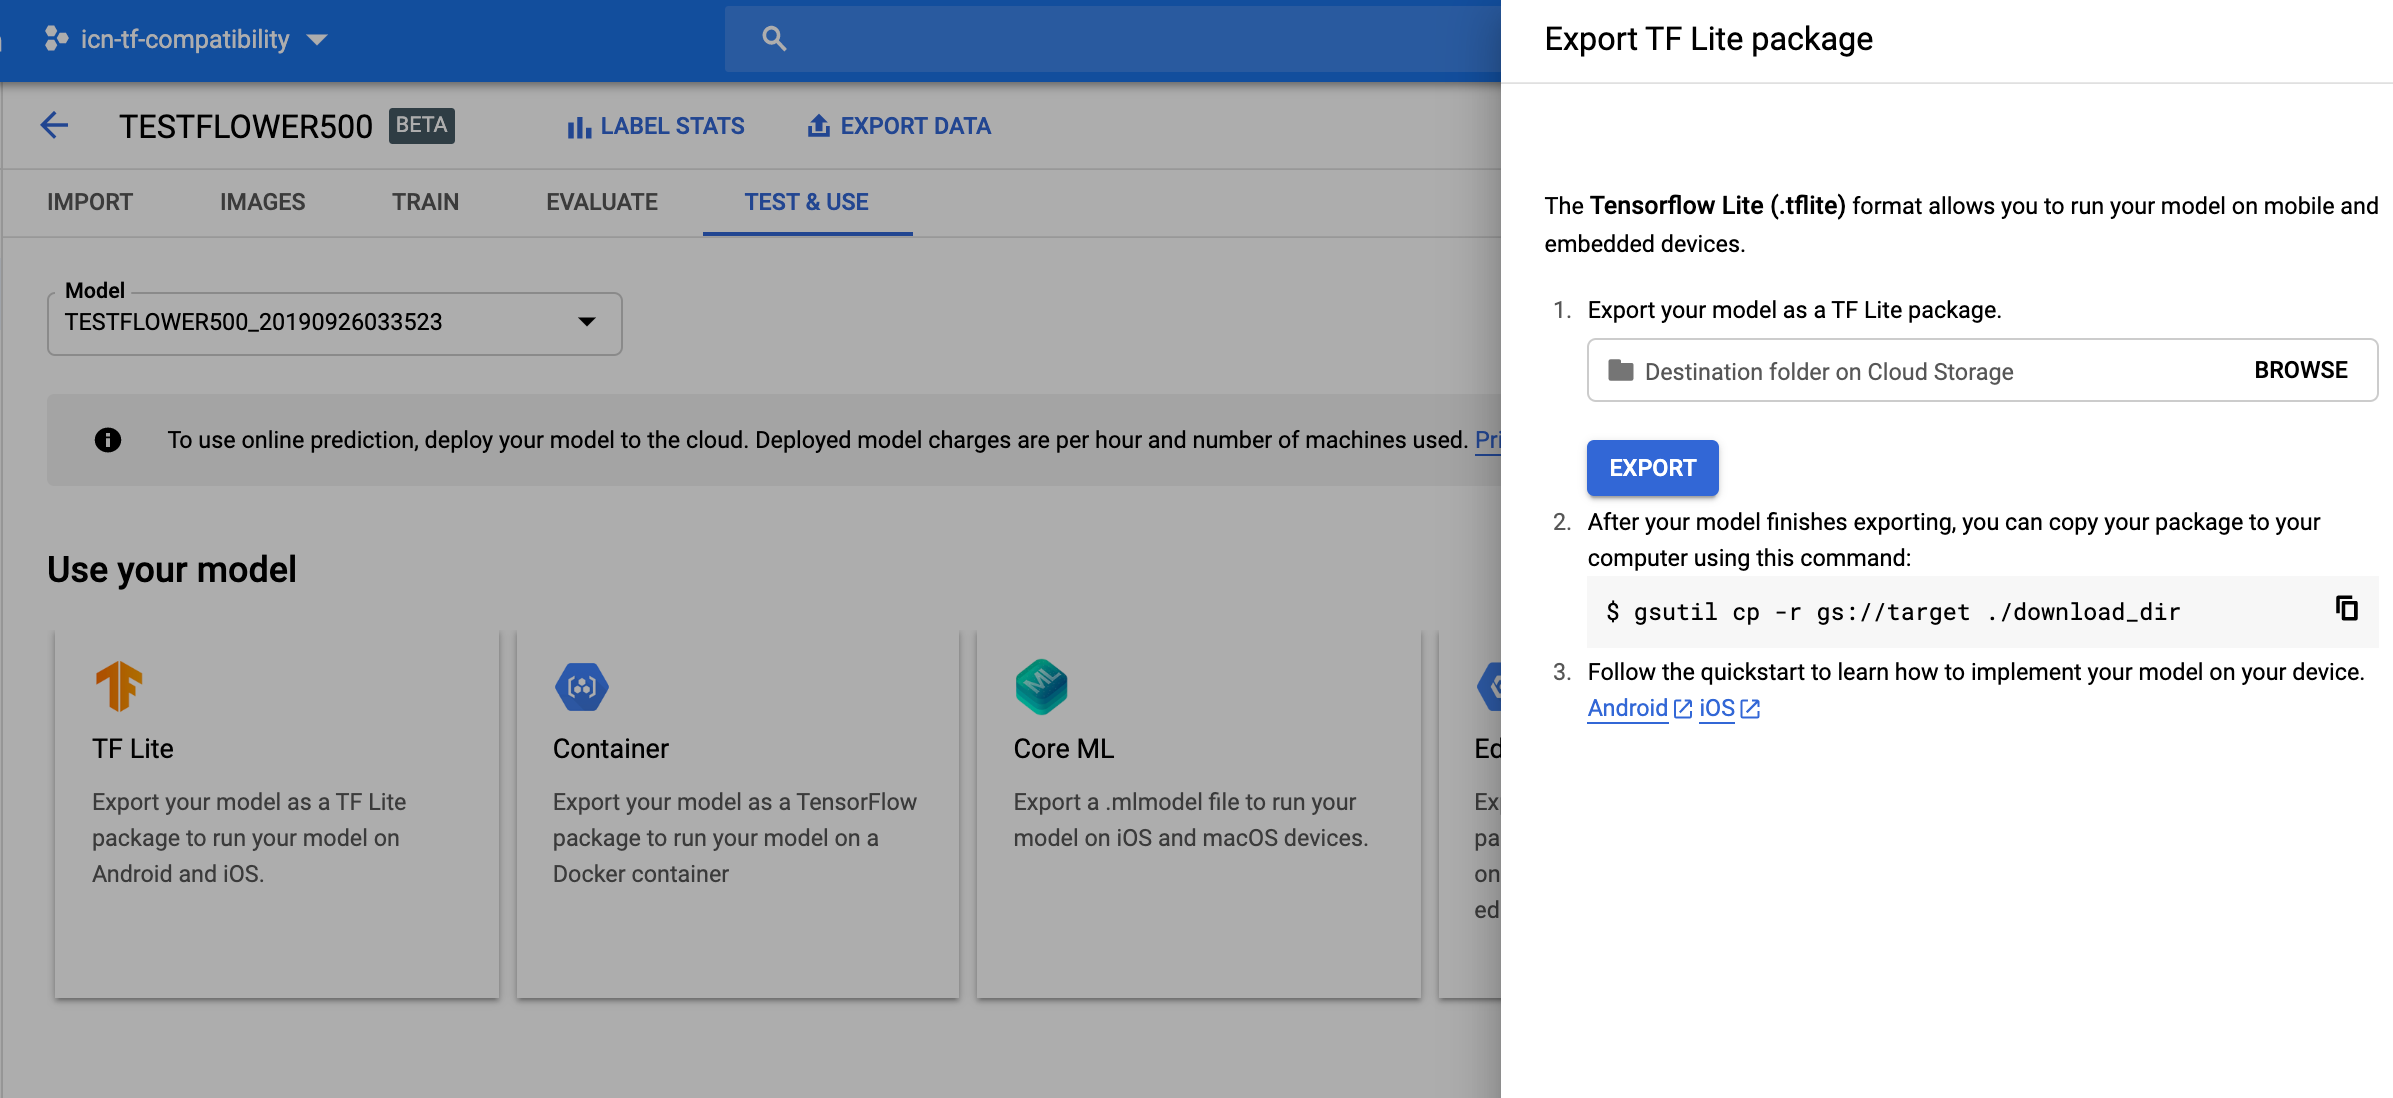 updated Export TF Lite model image